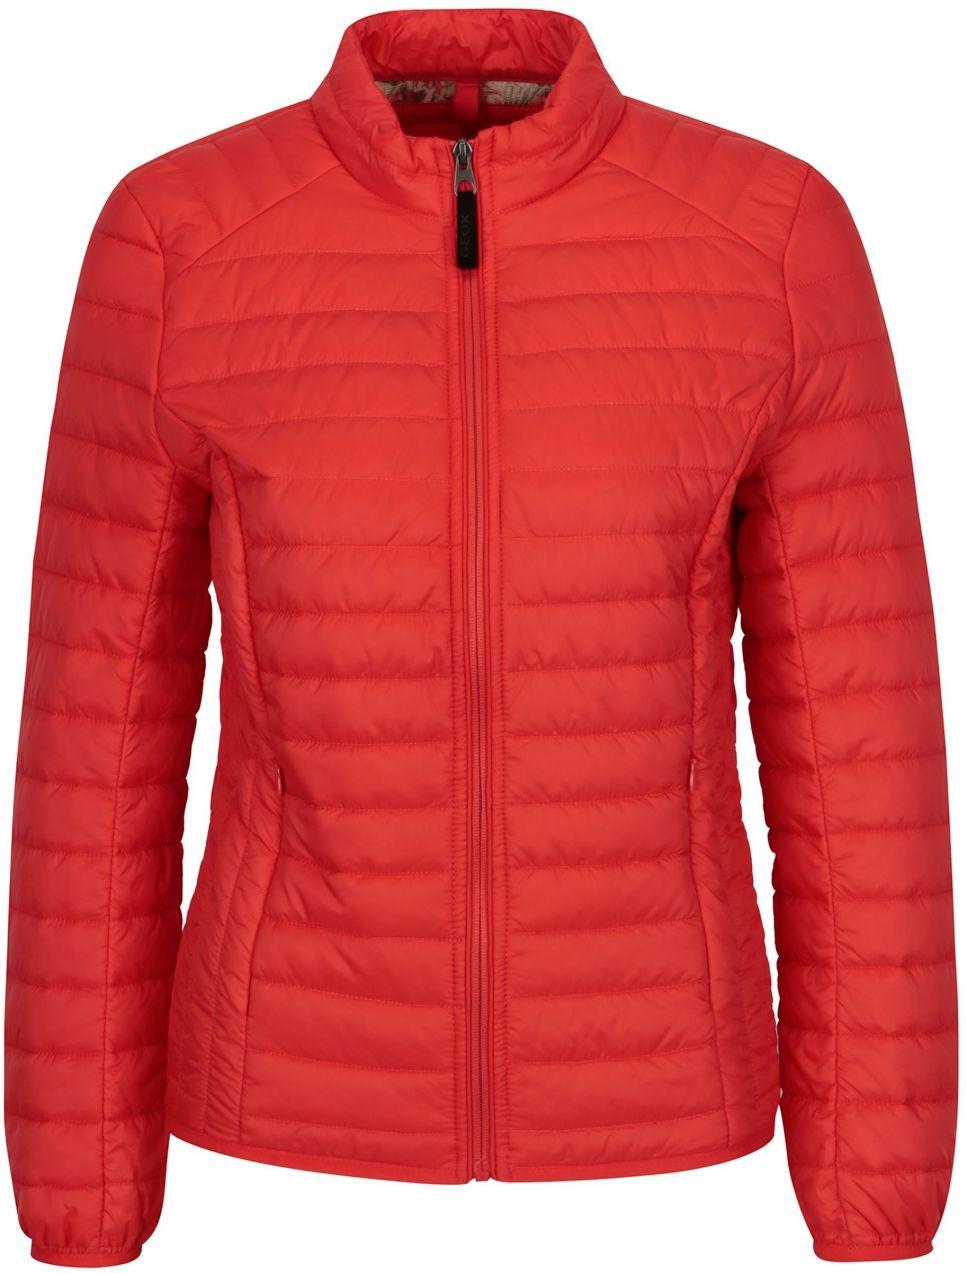 Červená dámska prešívaná bunda Geox značky Geox - Lovely.sk a8150578bd6